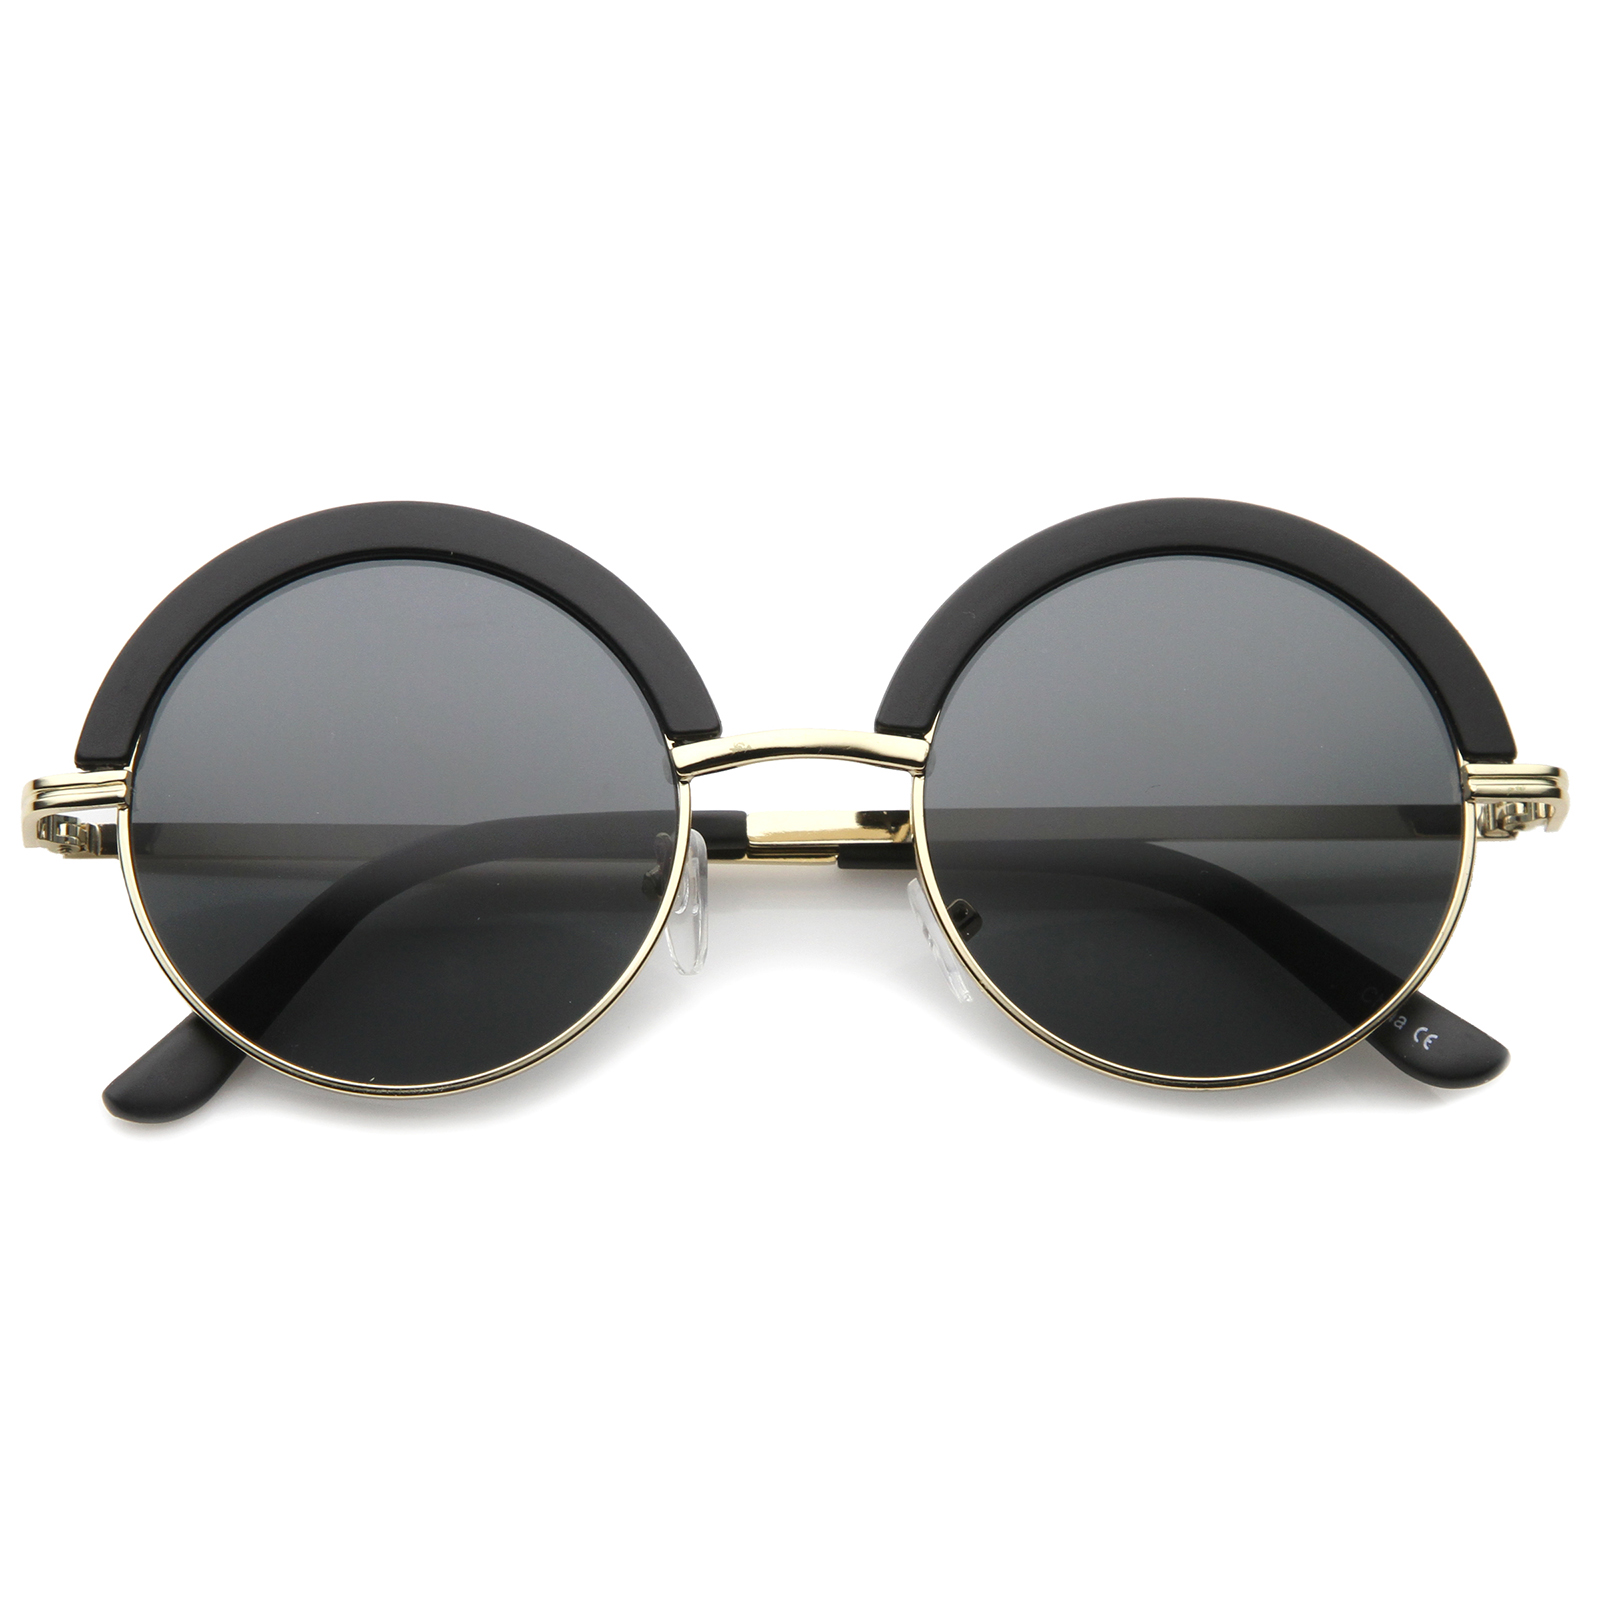 Half Framed Fashion Glasses : sunglassLA Mod Fashion Oversize Half-Frame Brow Eyelid ...